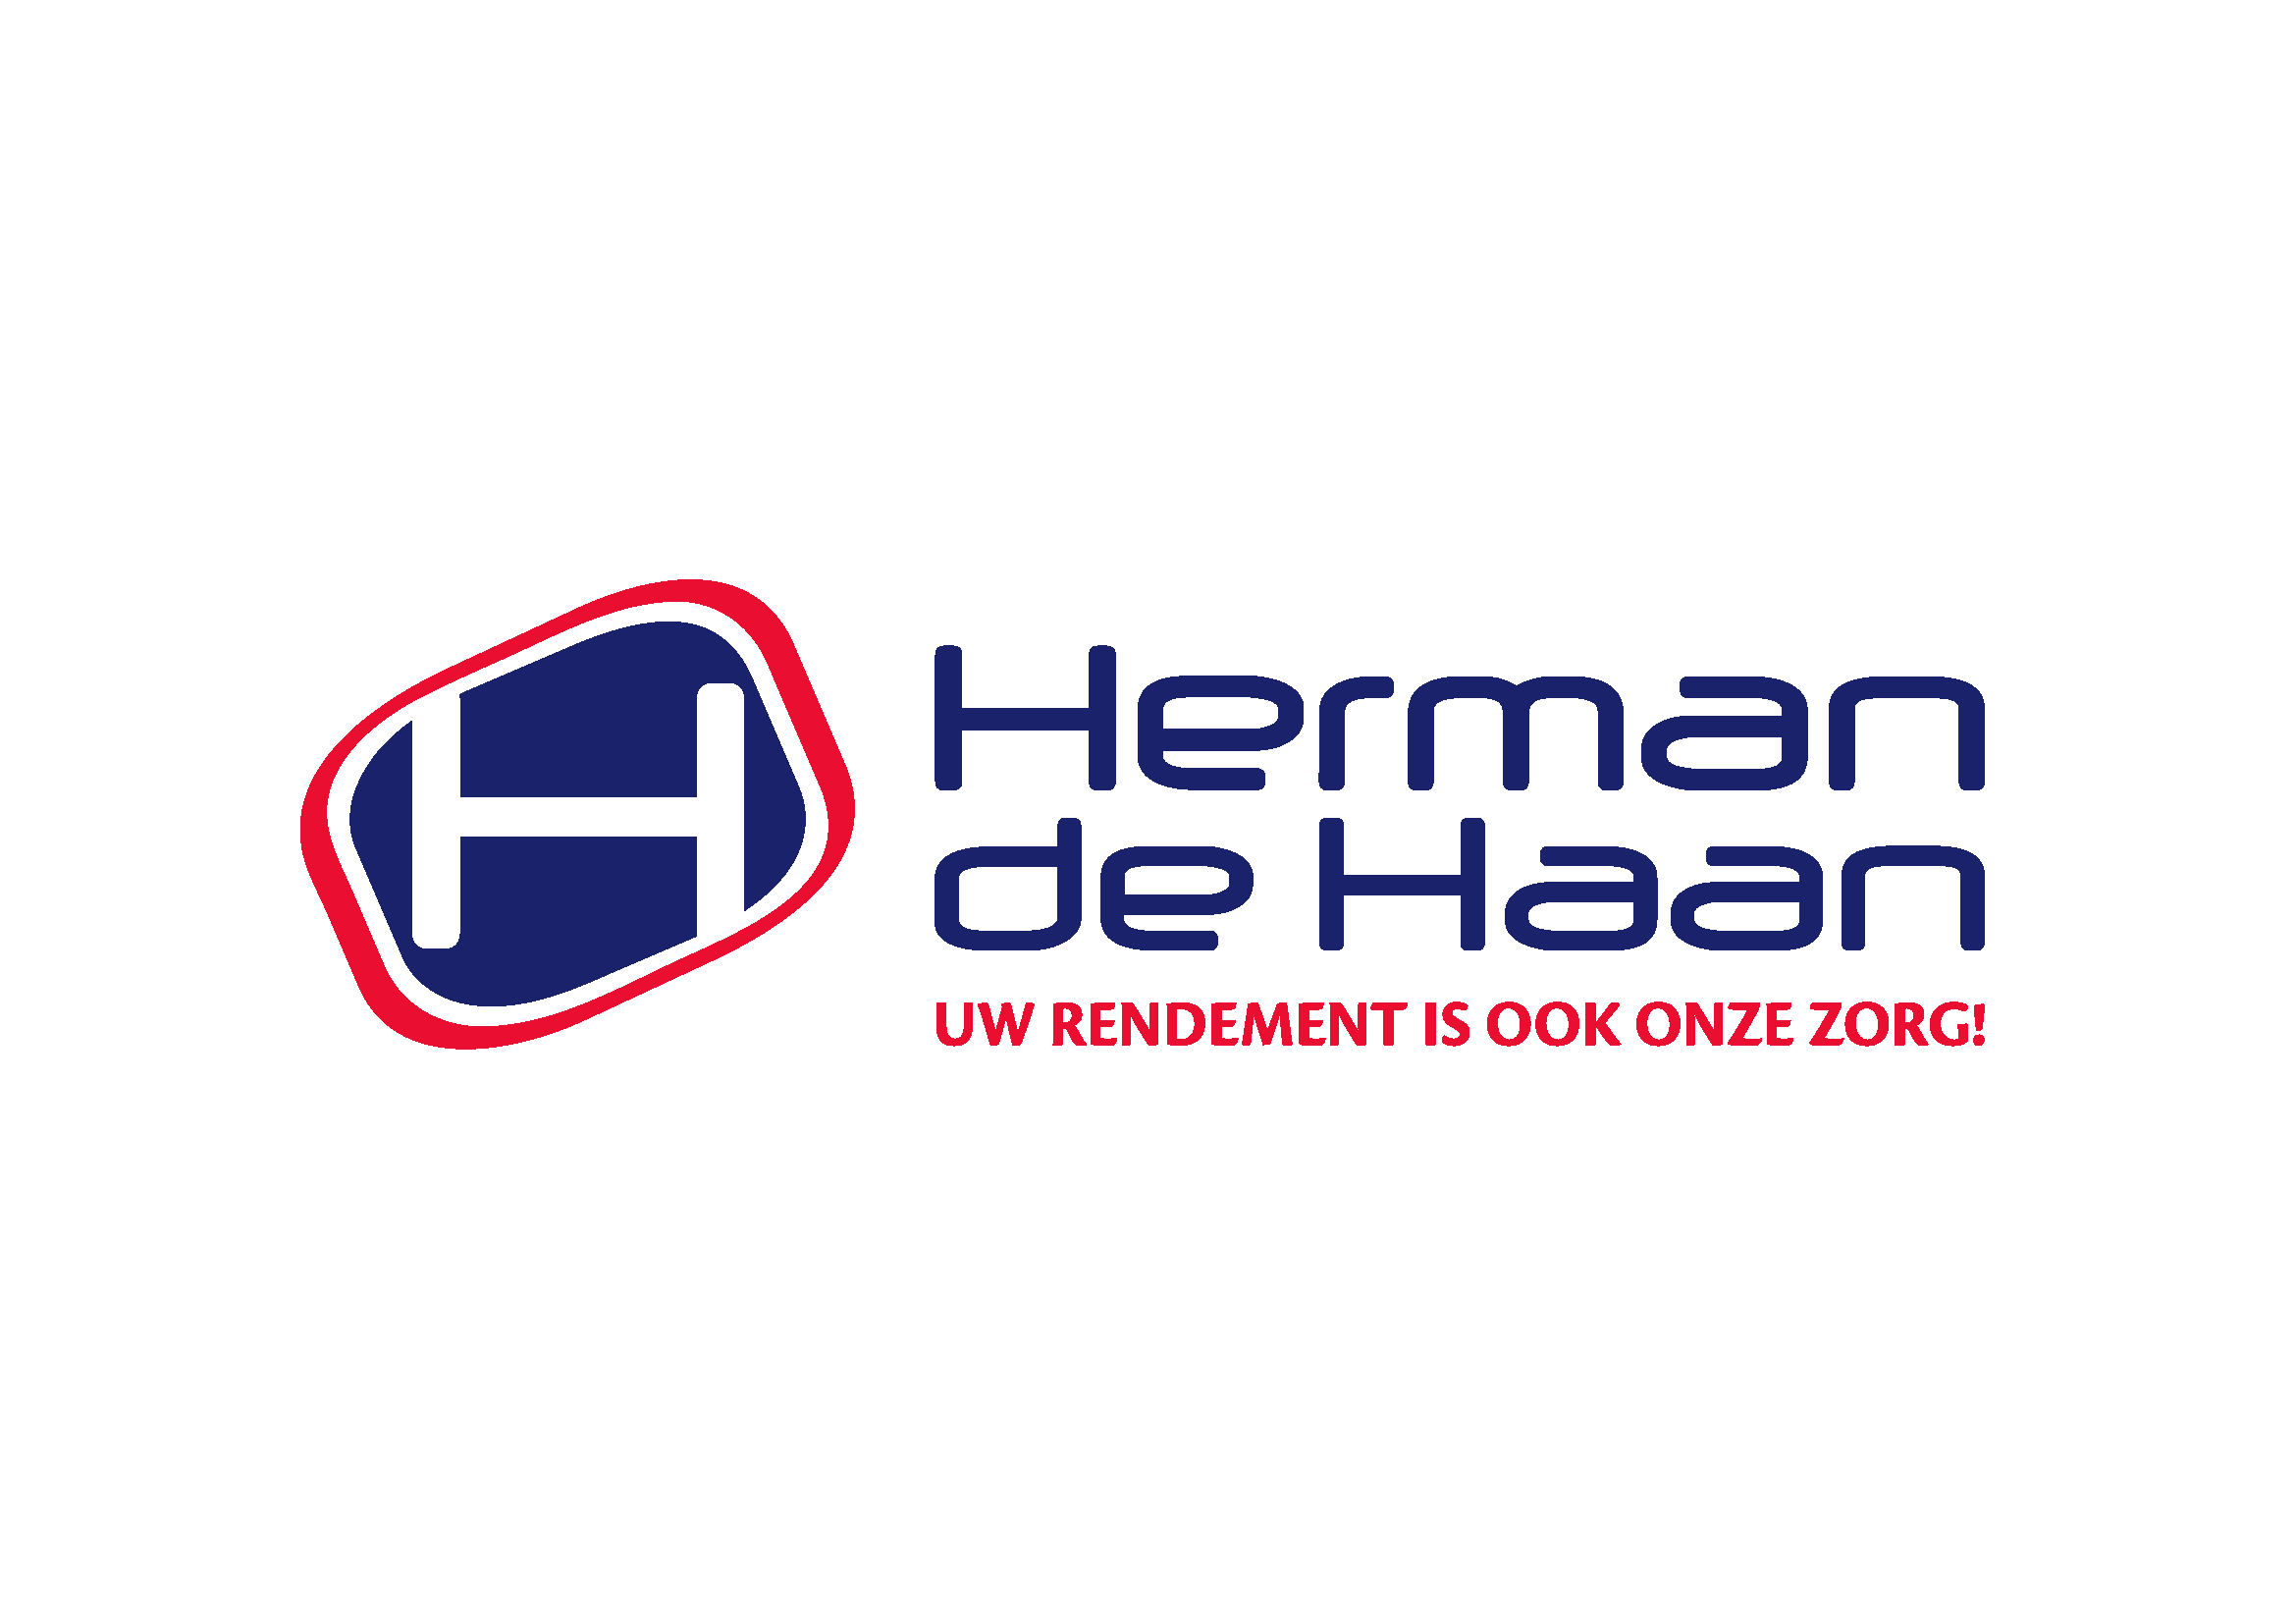 02 HermandeHaan - logo